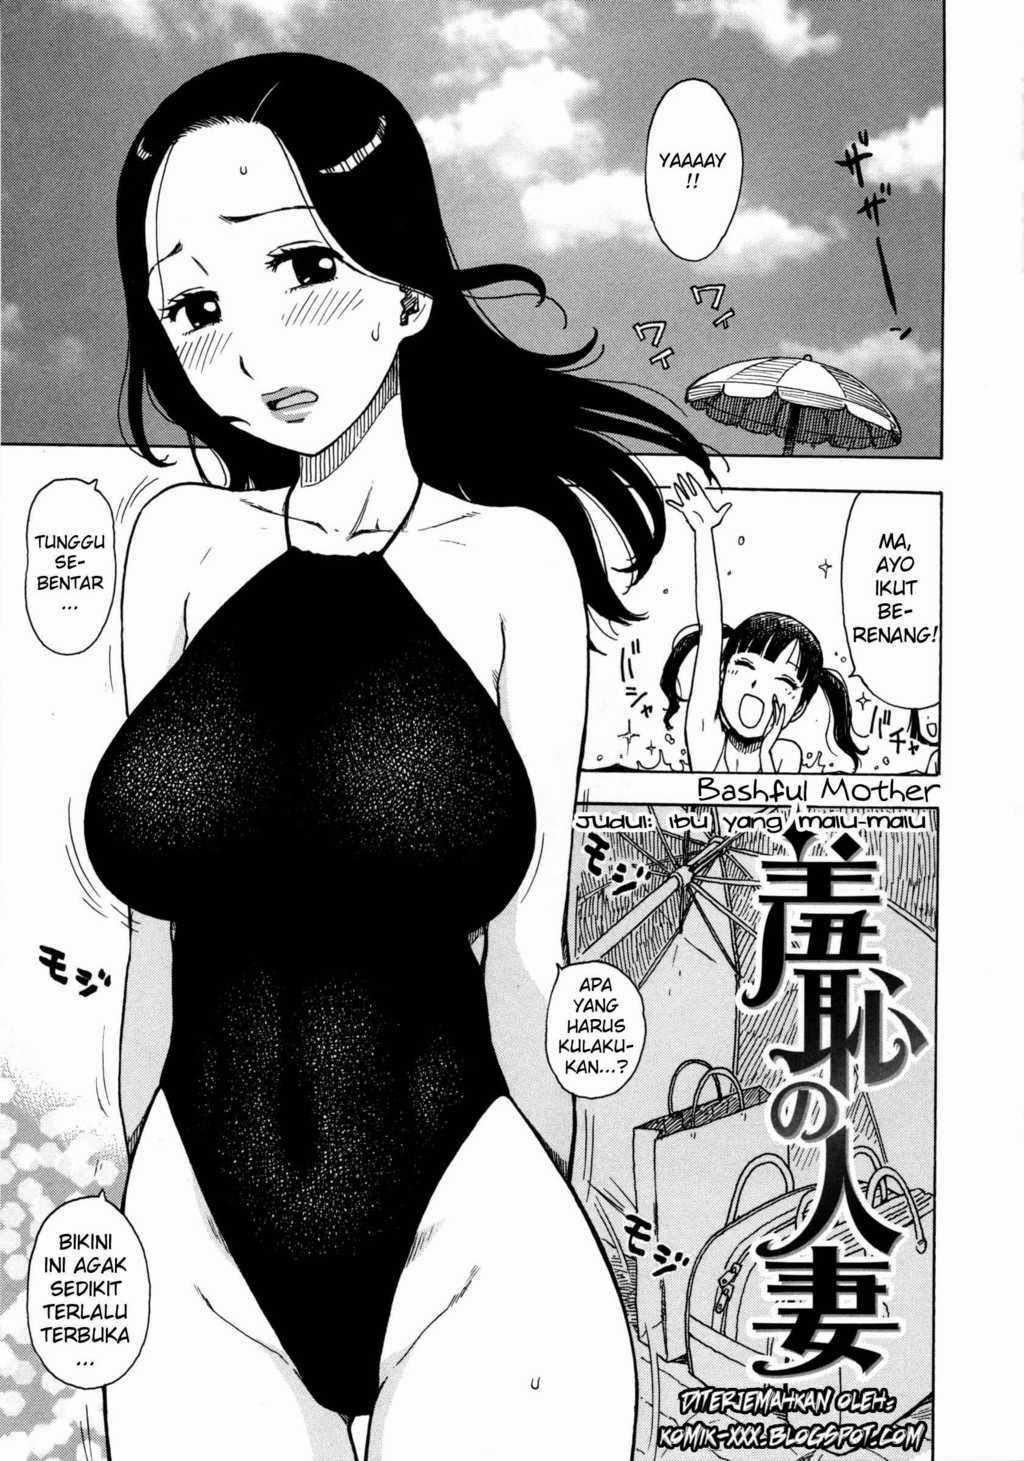 Komik Hentai | Manga Hentai | Komik XXX | Komik Porno | Komik SEX | komik dewasa | komik ngentot | komik hentai sex | komik sex naruto | komik sex one piece | komik hentai manga | komik sex hot Komik hentai sex dijepit vagina sempit tante di pantai